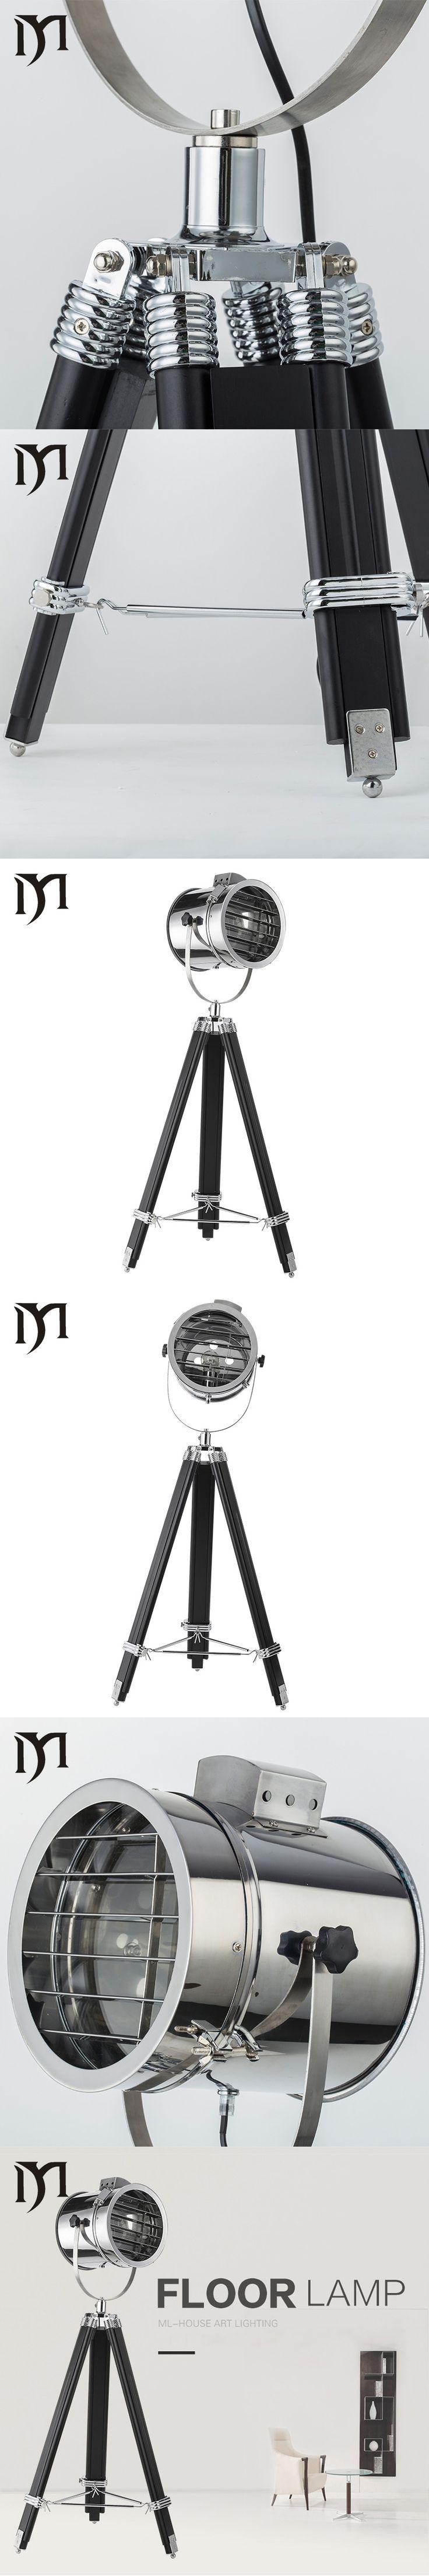 Tripod LED Floor Lamp Led Bulb Lamp Modern Stand Light Indoor Lighting for Living Room Study Bedside Reading Piano Lamp